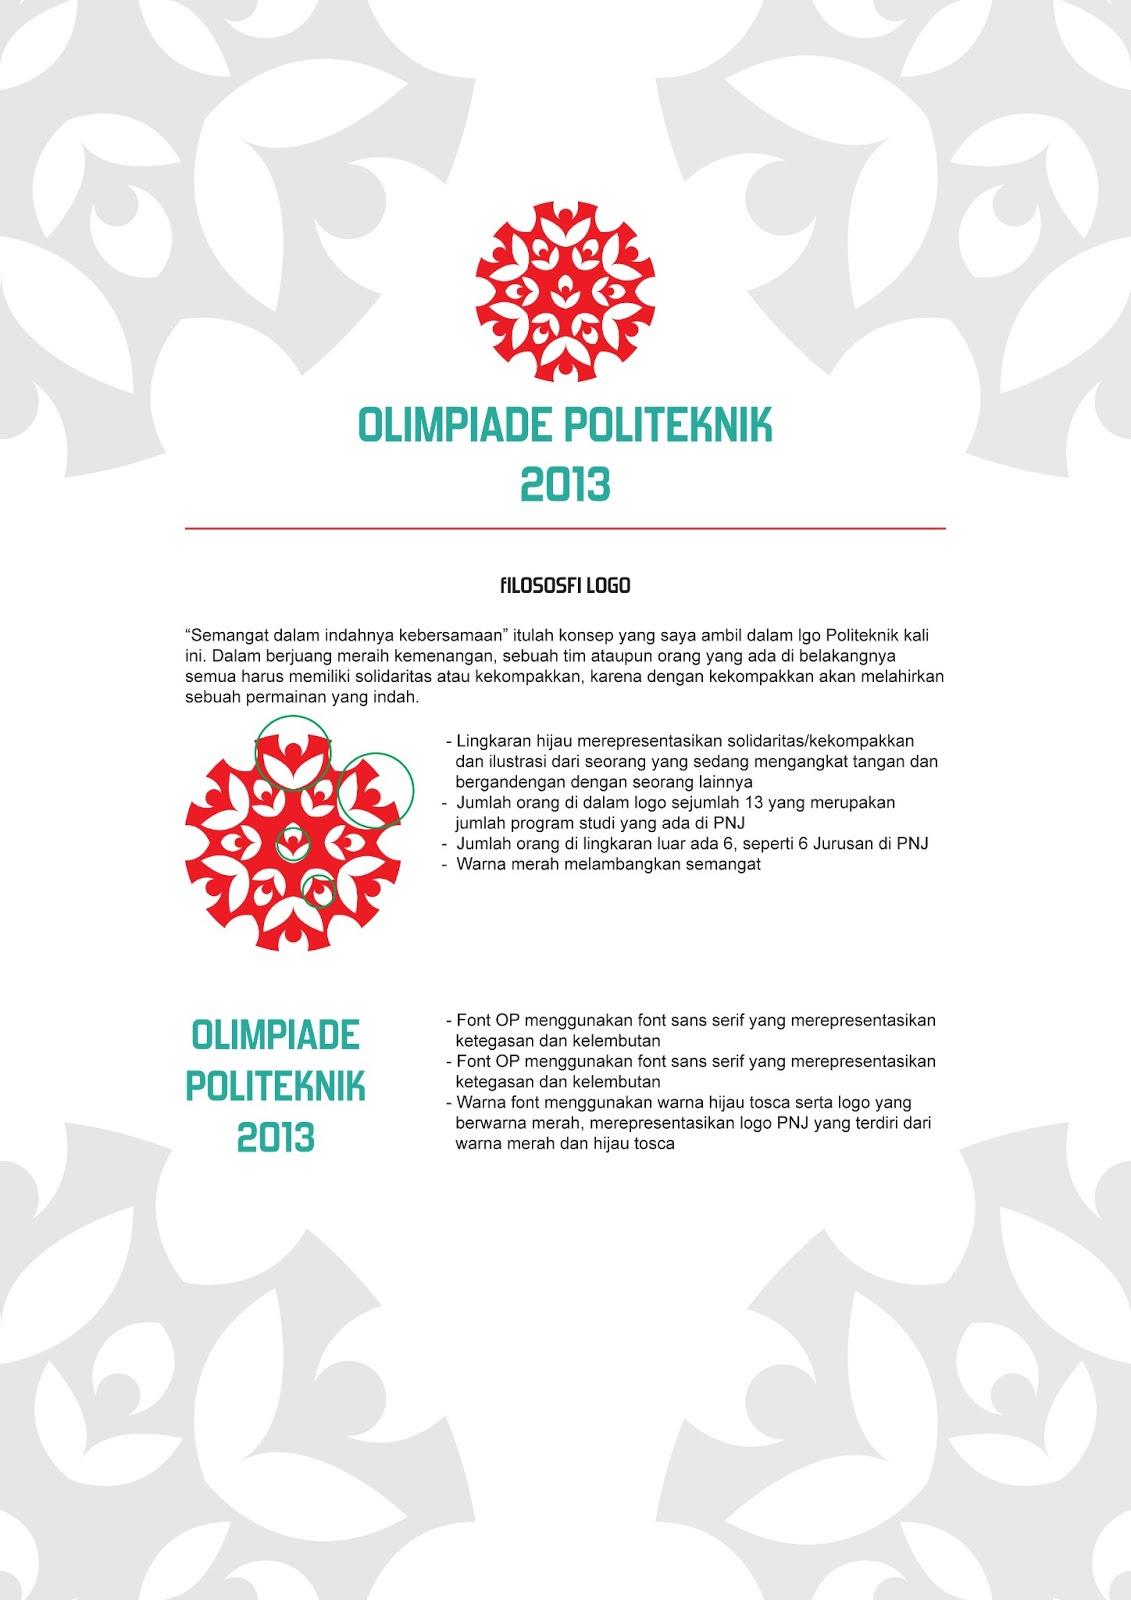 olimpiade politeknik negeri jakarta logo baru semangat baru